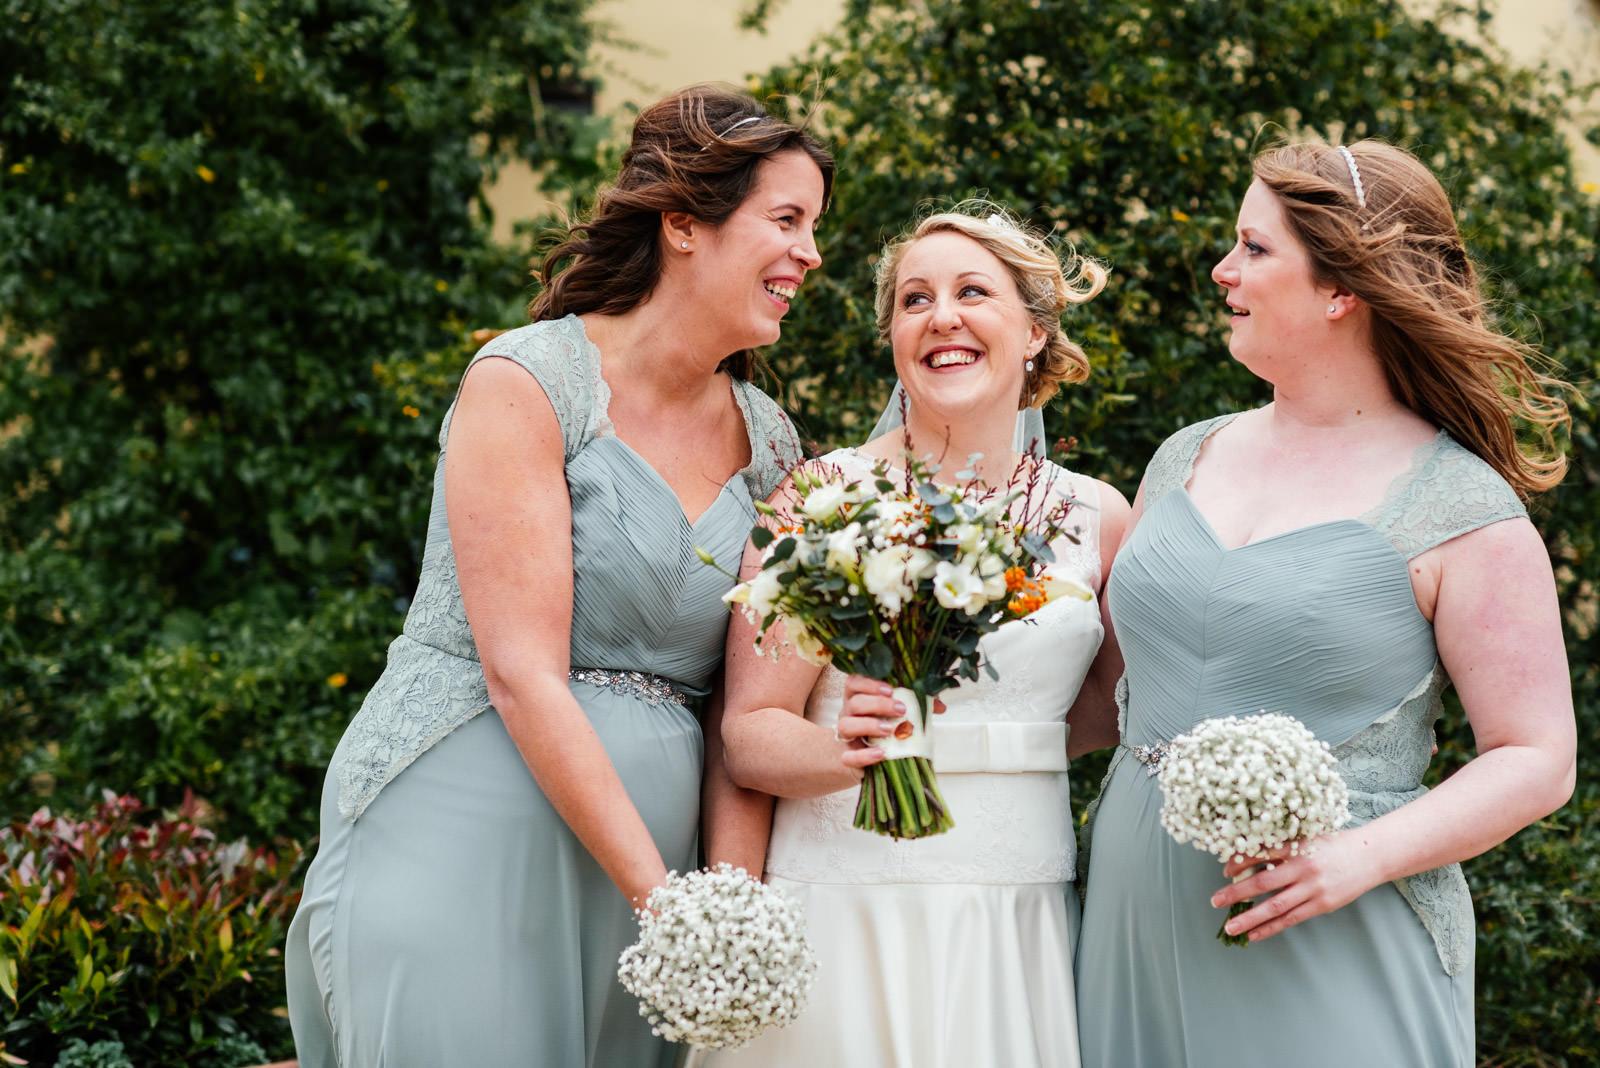 Bride and bridesmaids group photo